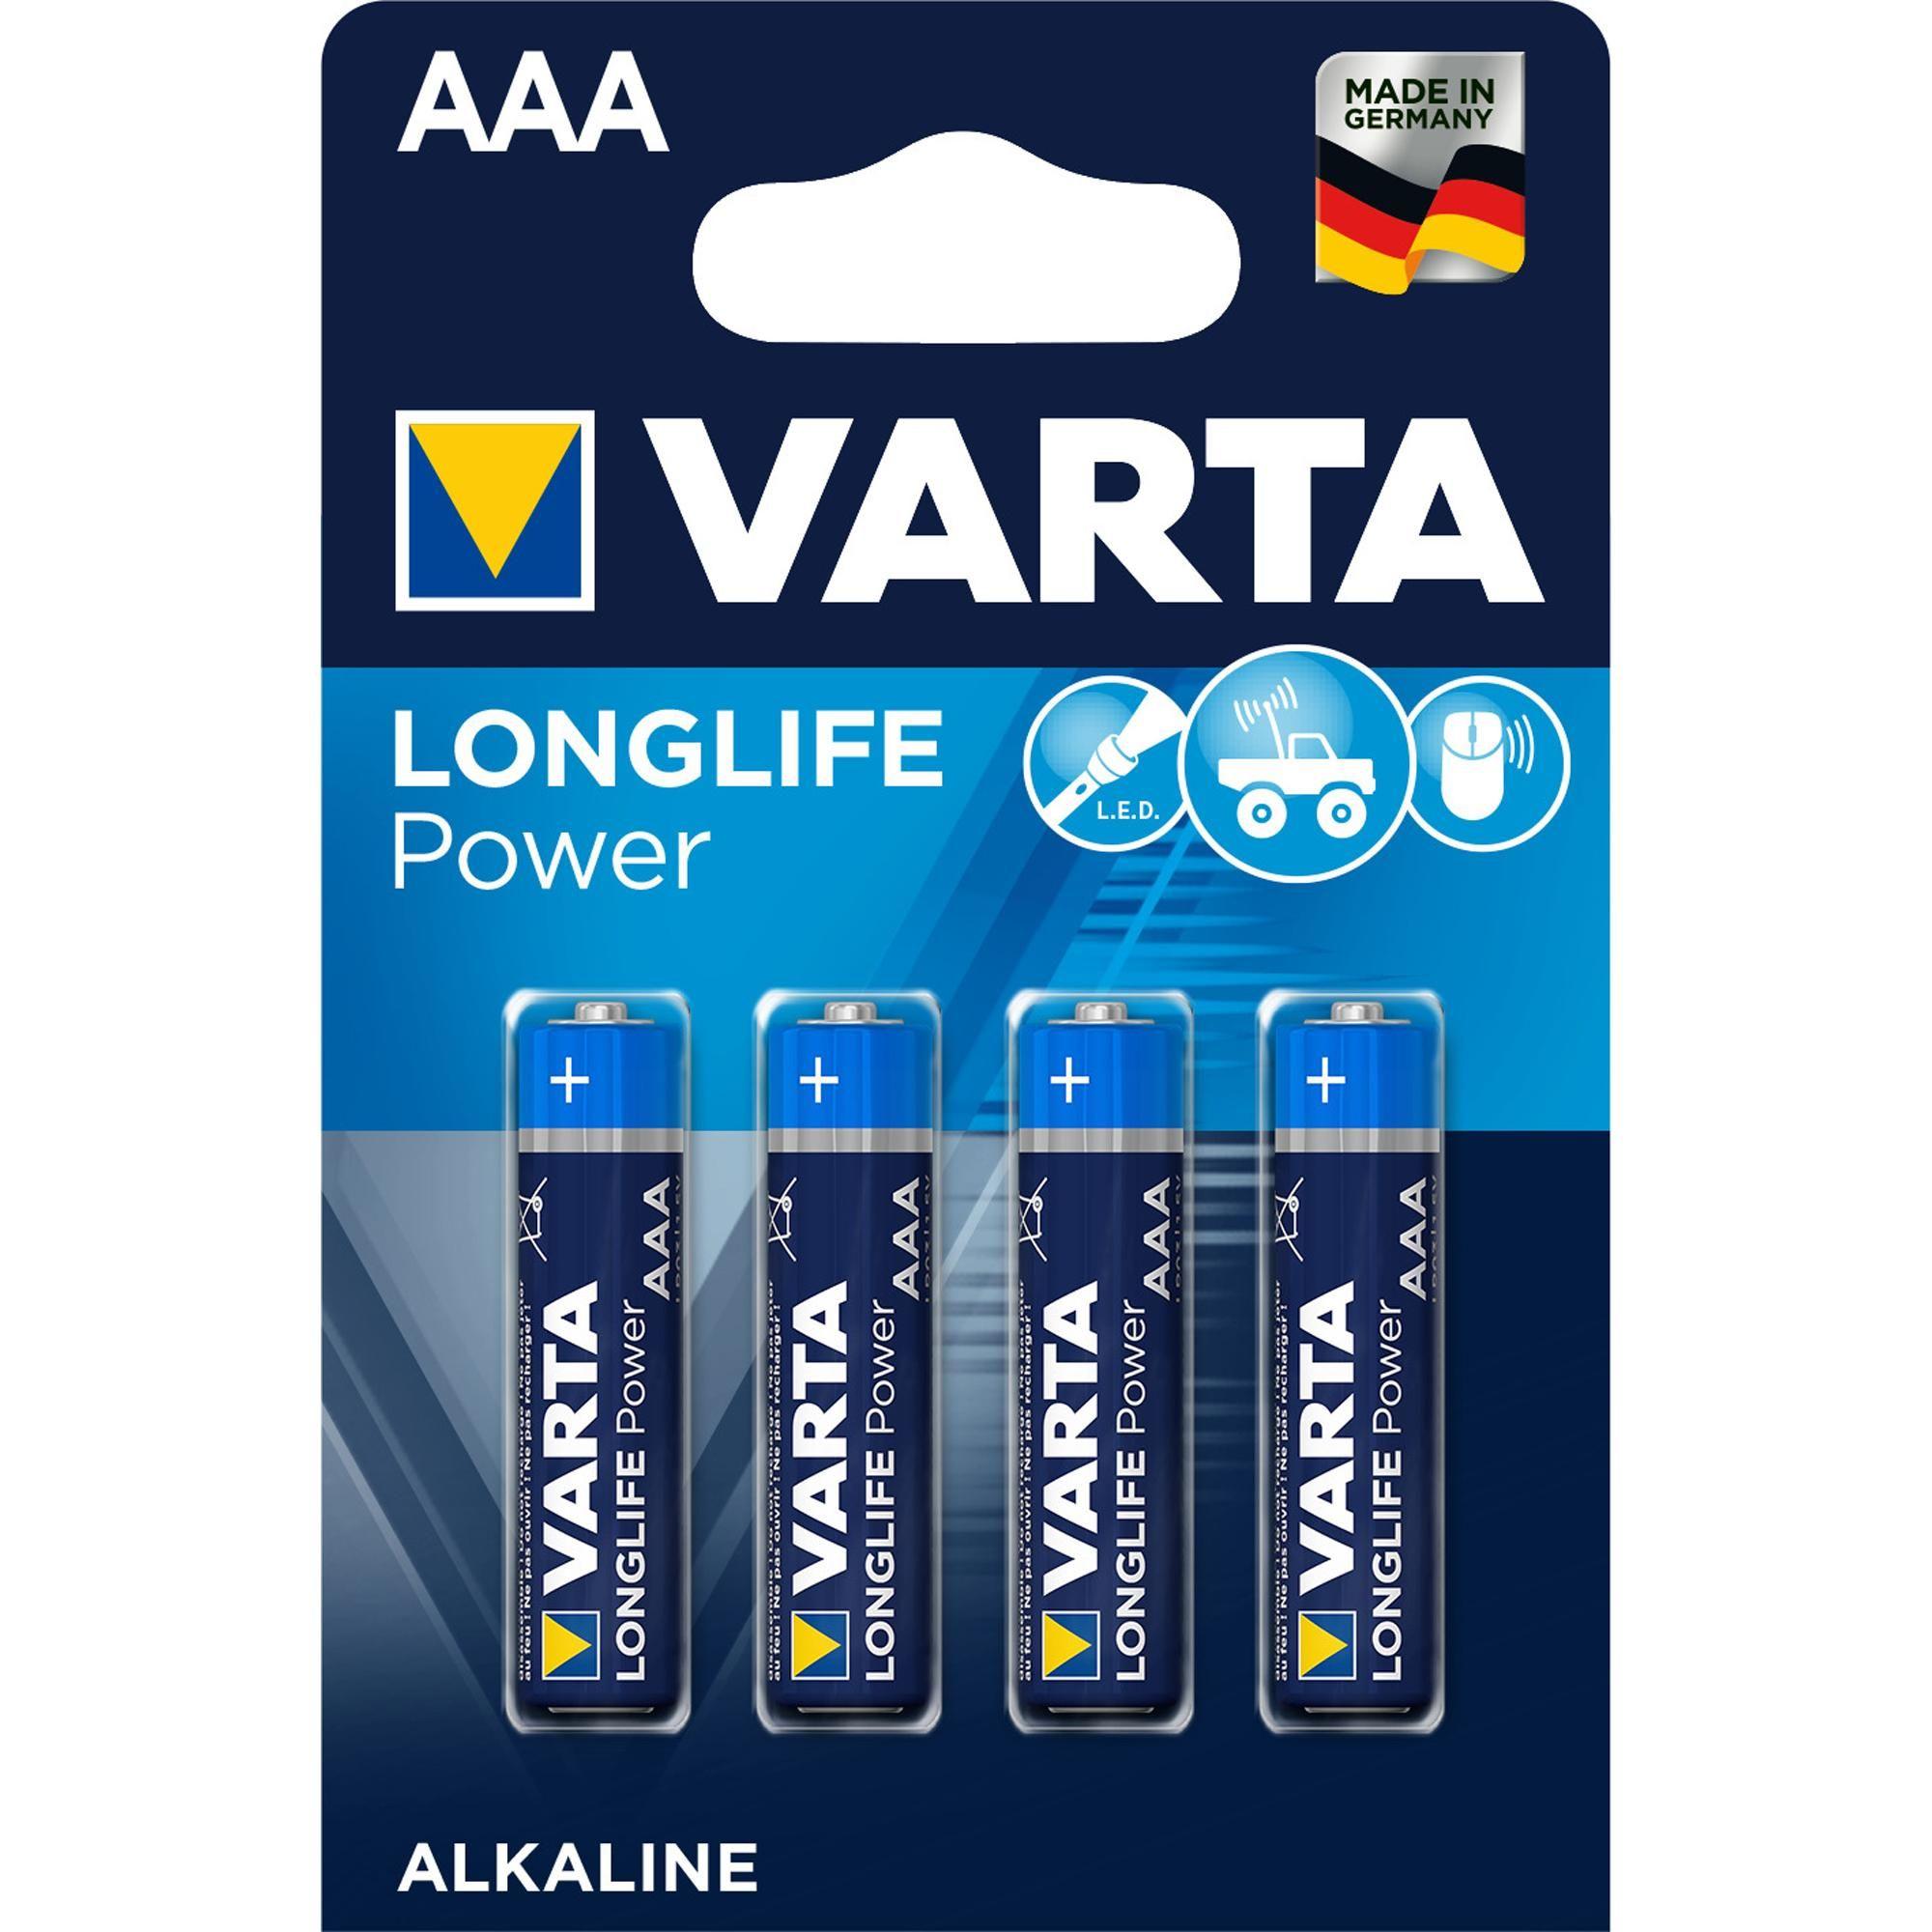 Varta High Energy Four Aaa Batteries High Energy Power Alkaline Battery